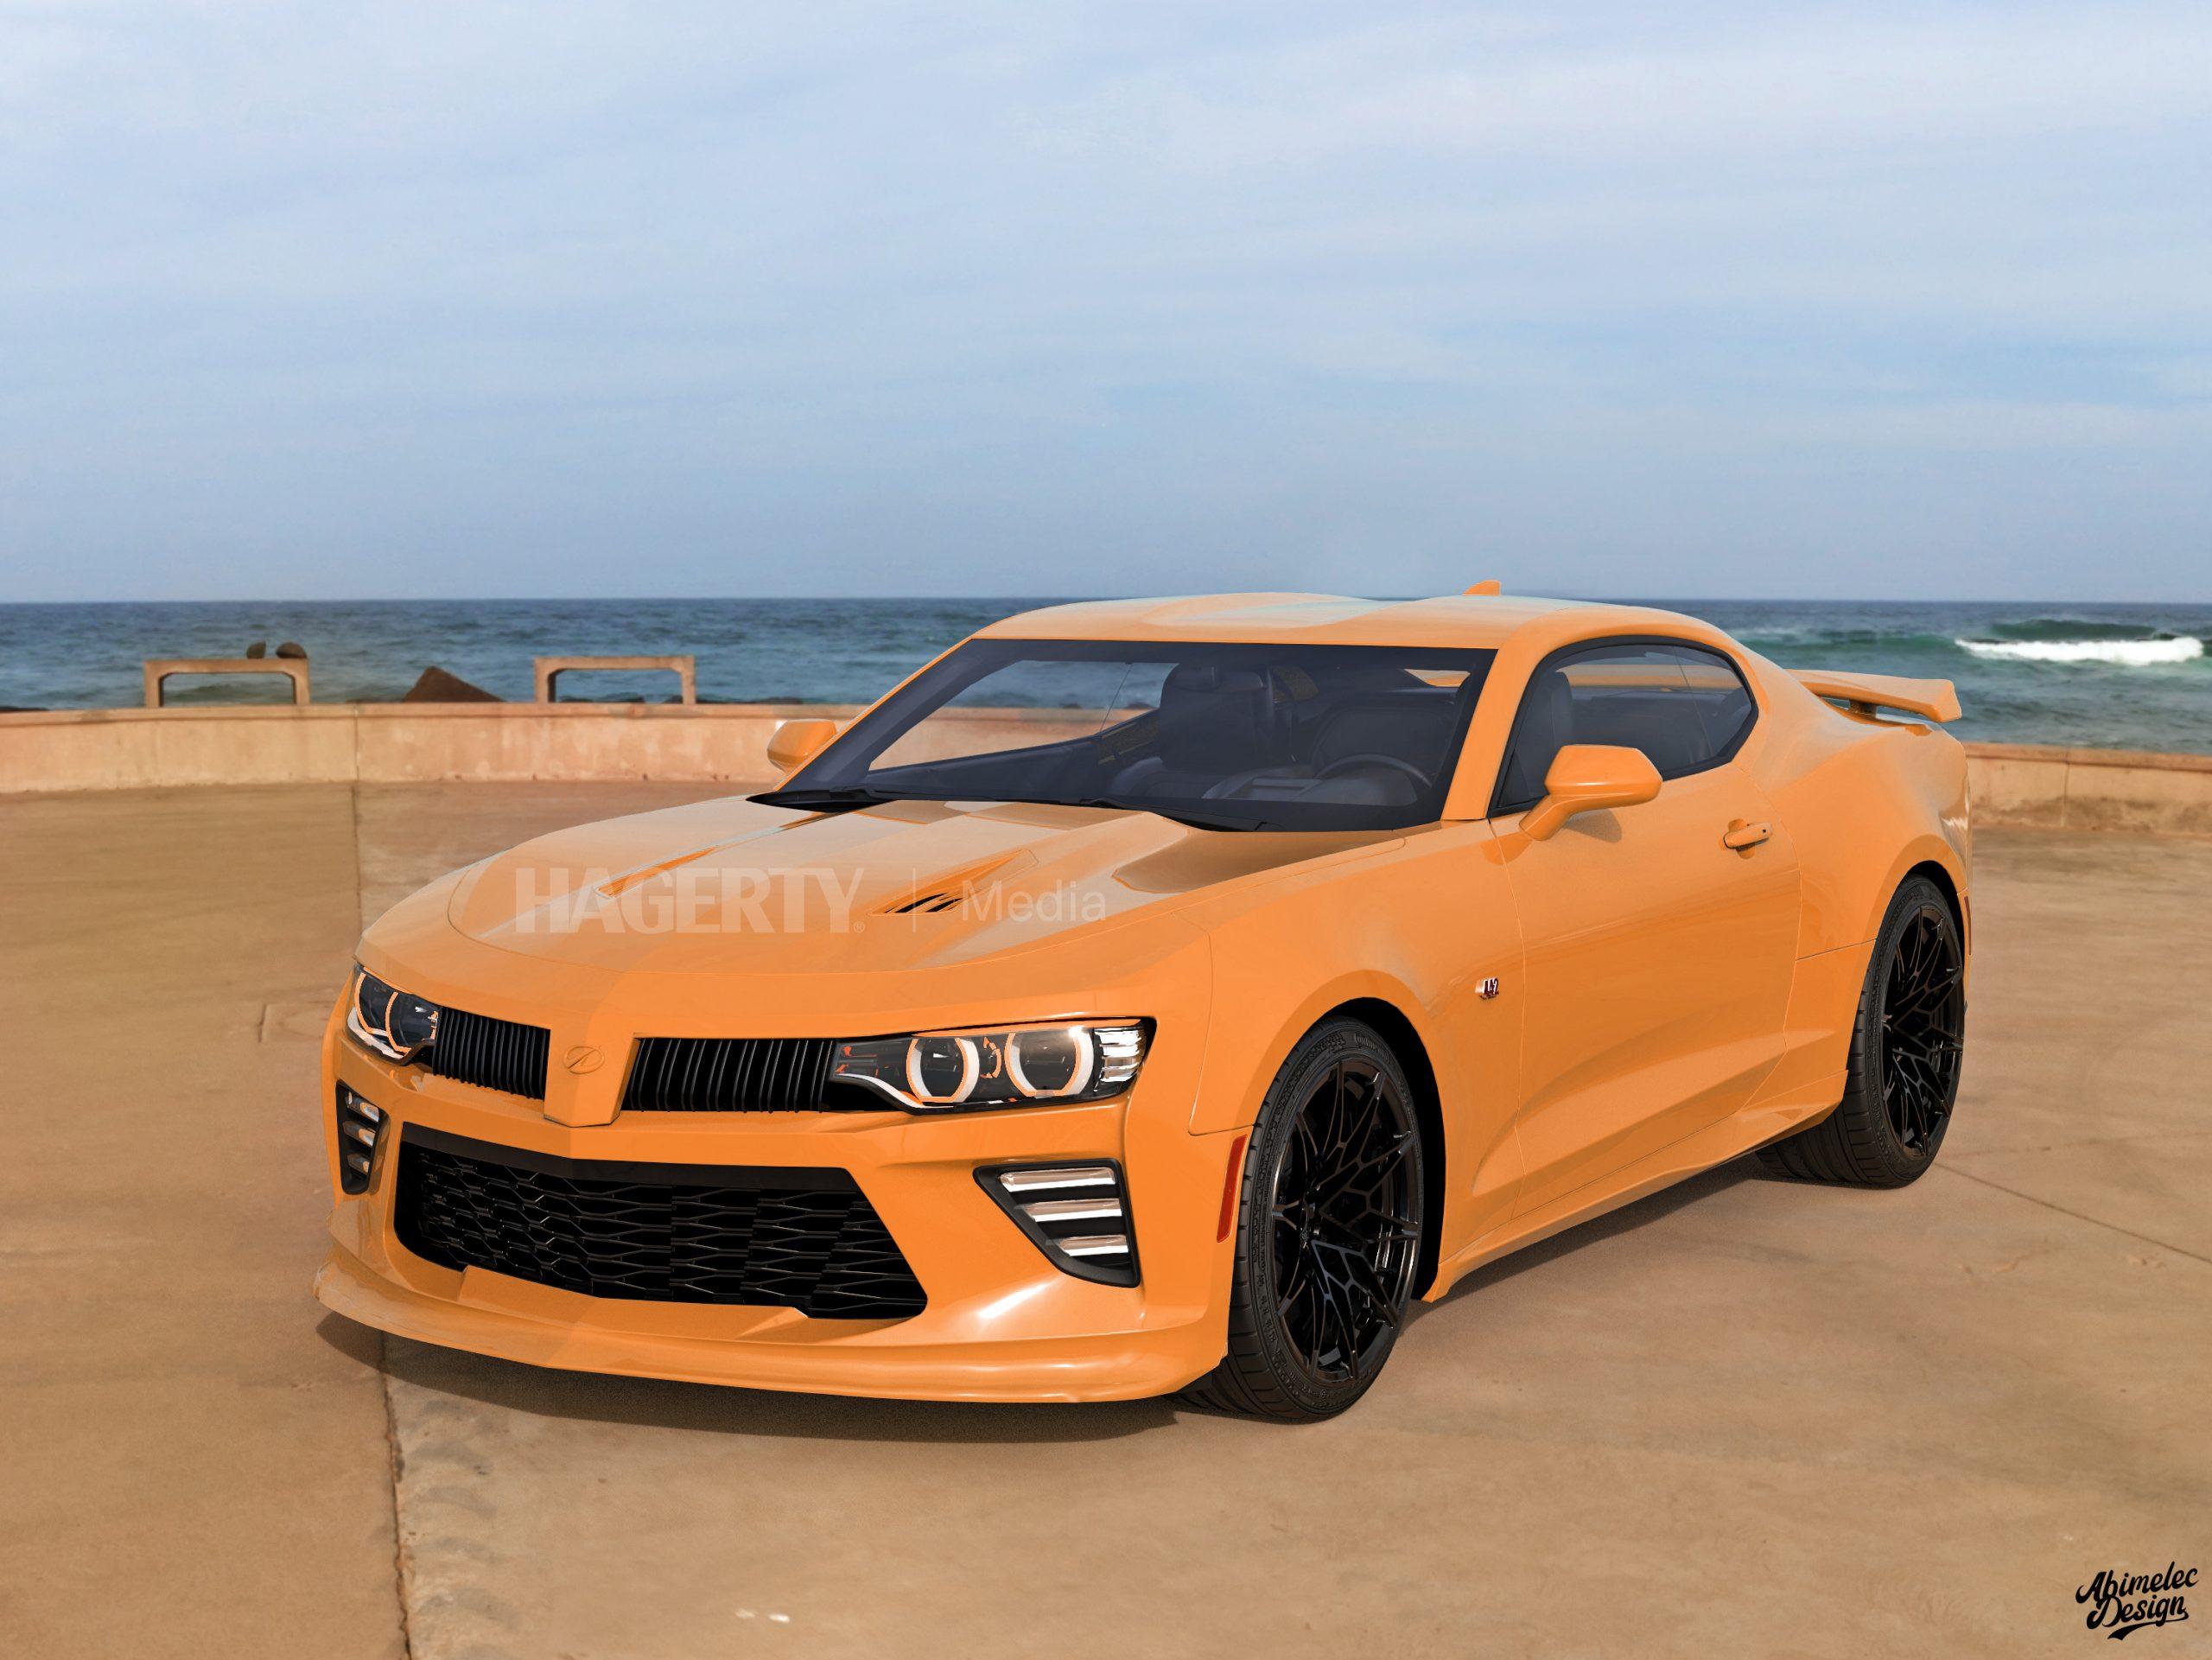 2021 Oldsmobile Cutlass Supreme what if graphic render orange